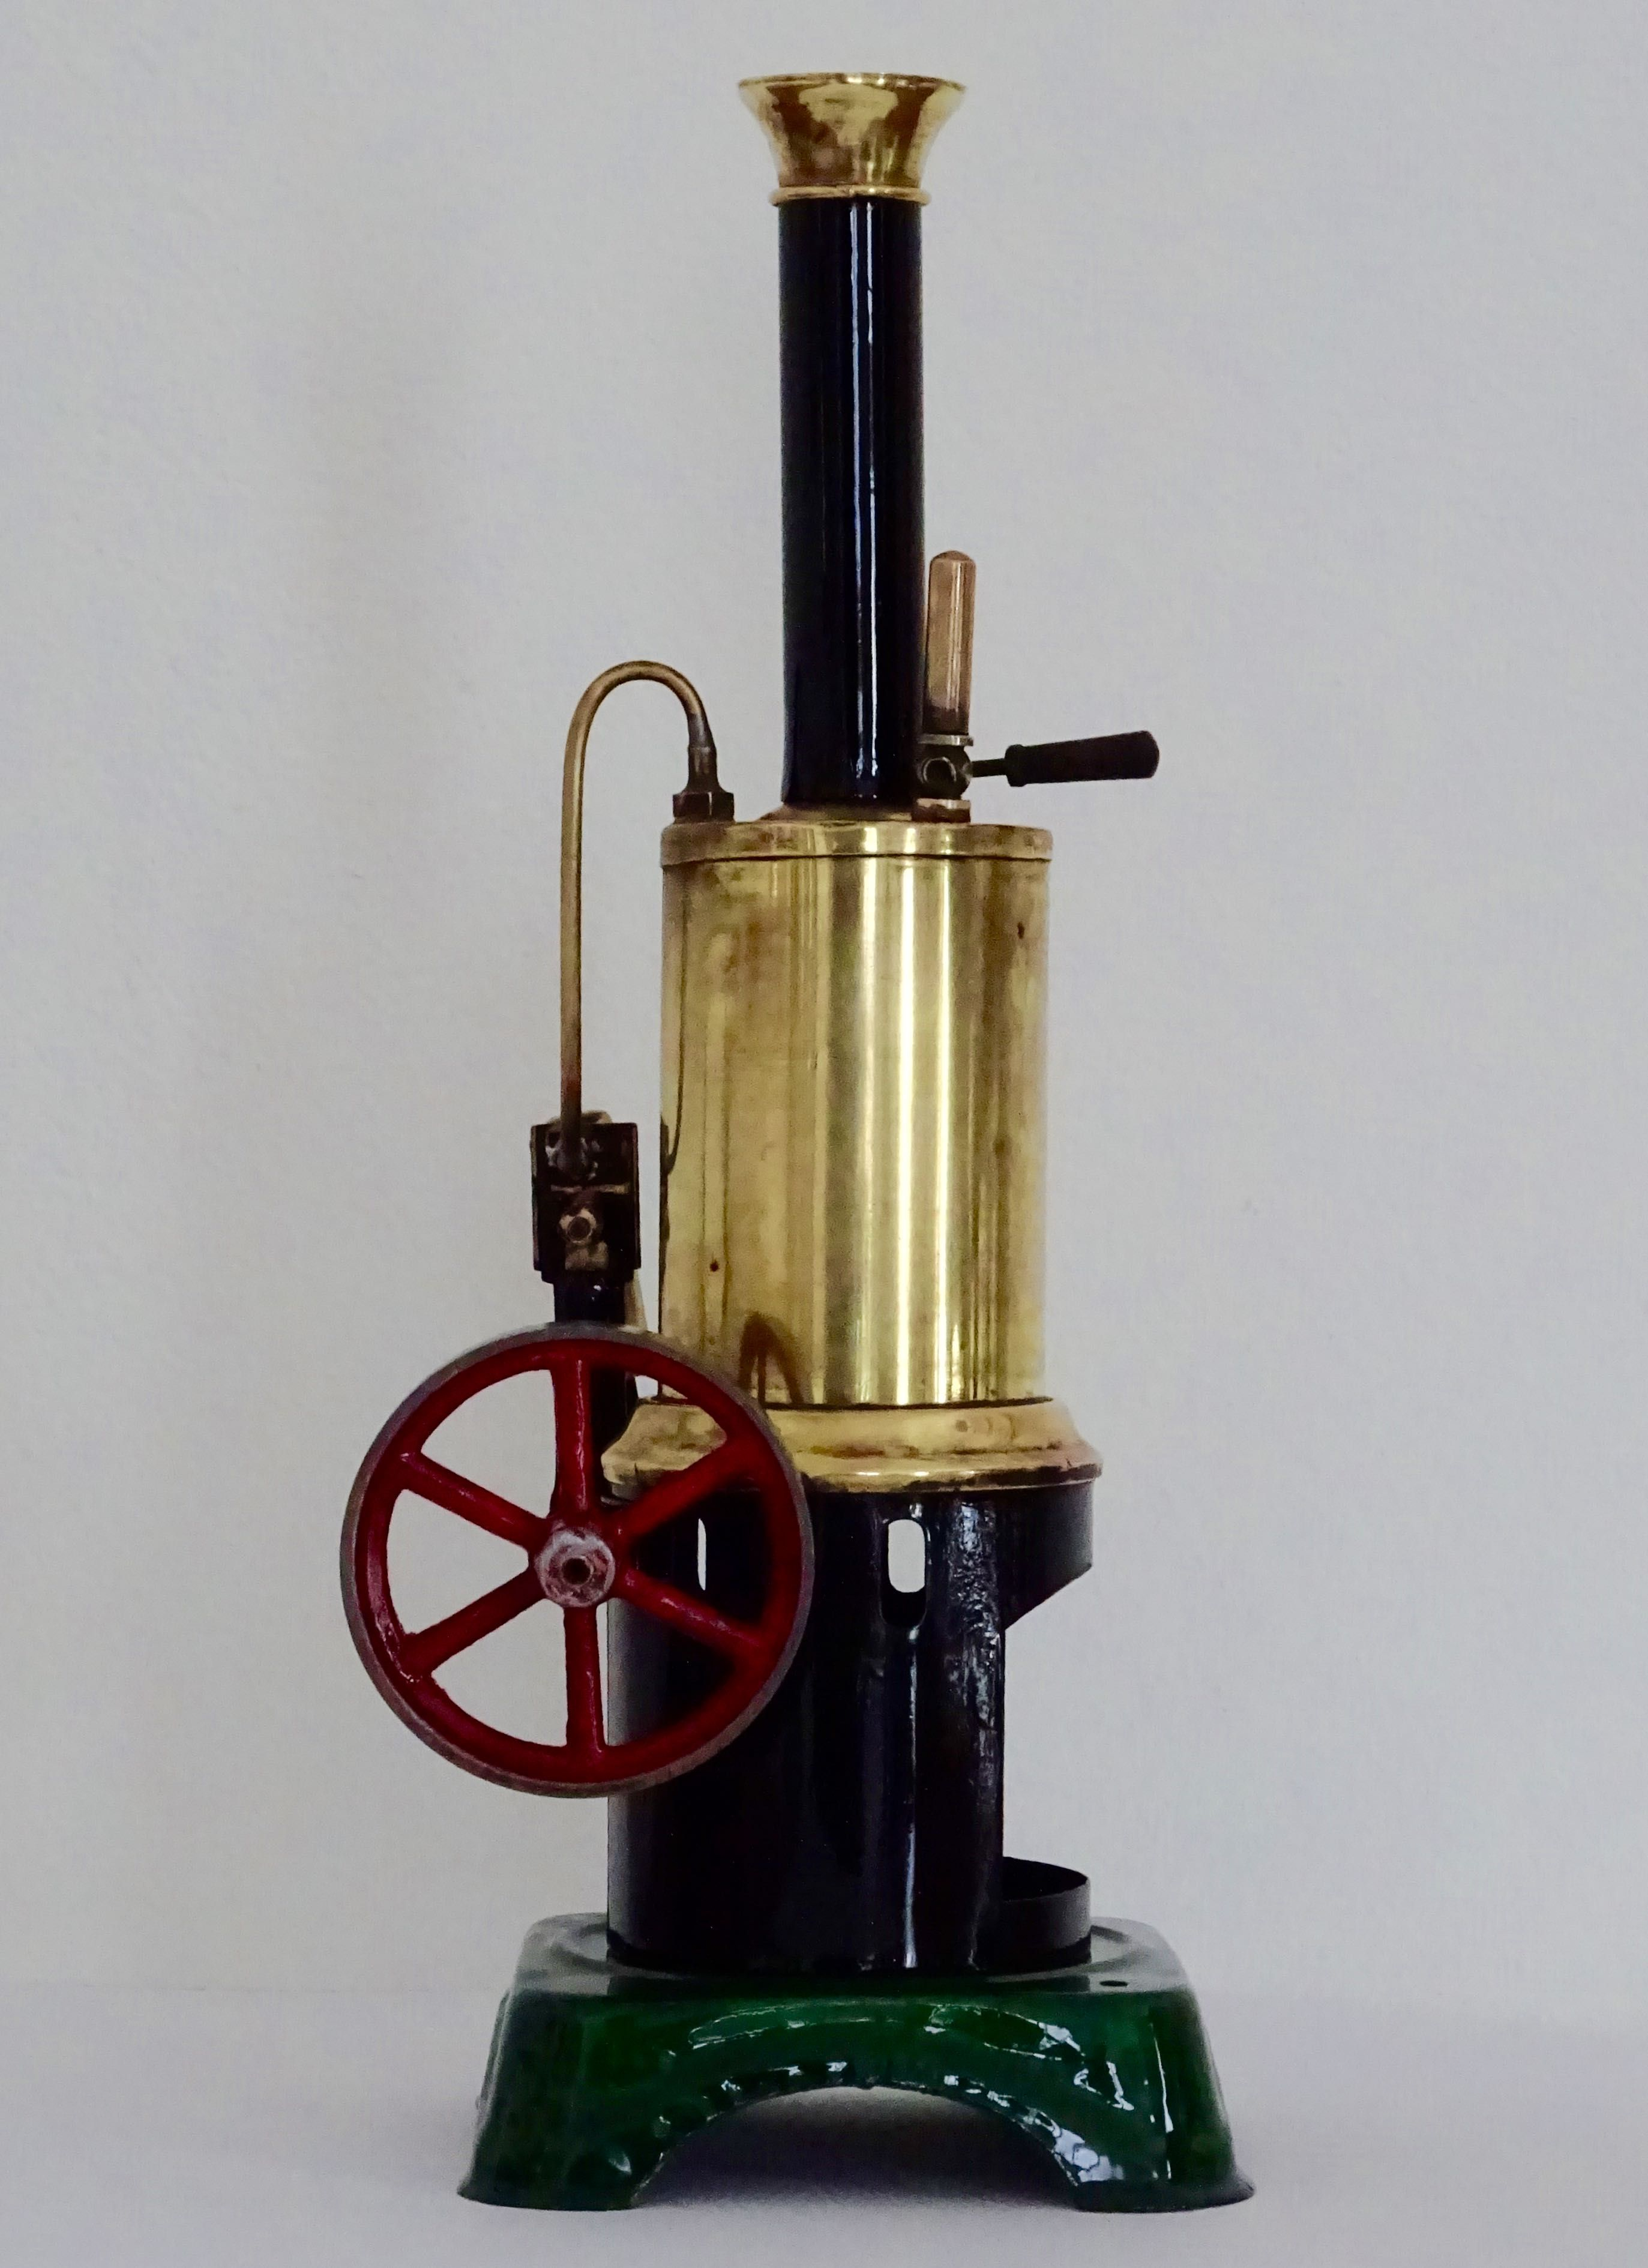 machine vapeur jc unis france jouets vapeur pinterest frances o 39 connor. Black Bedroom Furniture Sets. Home Design Ideas